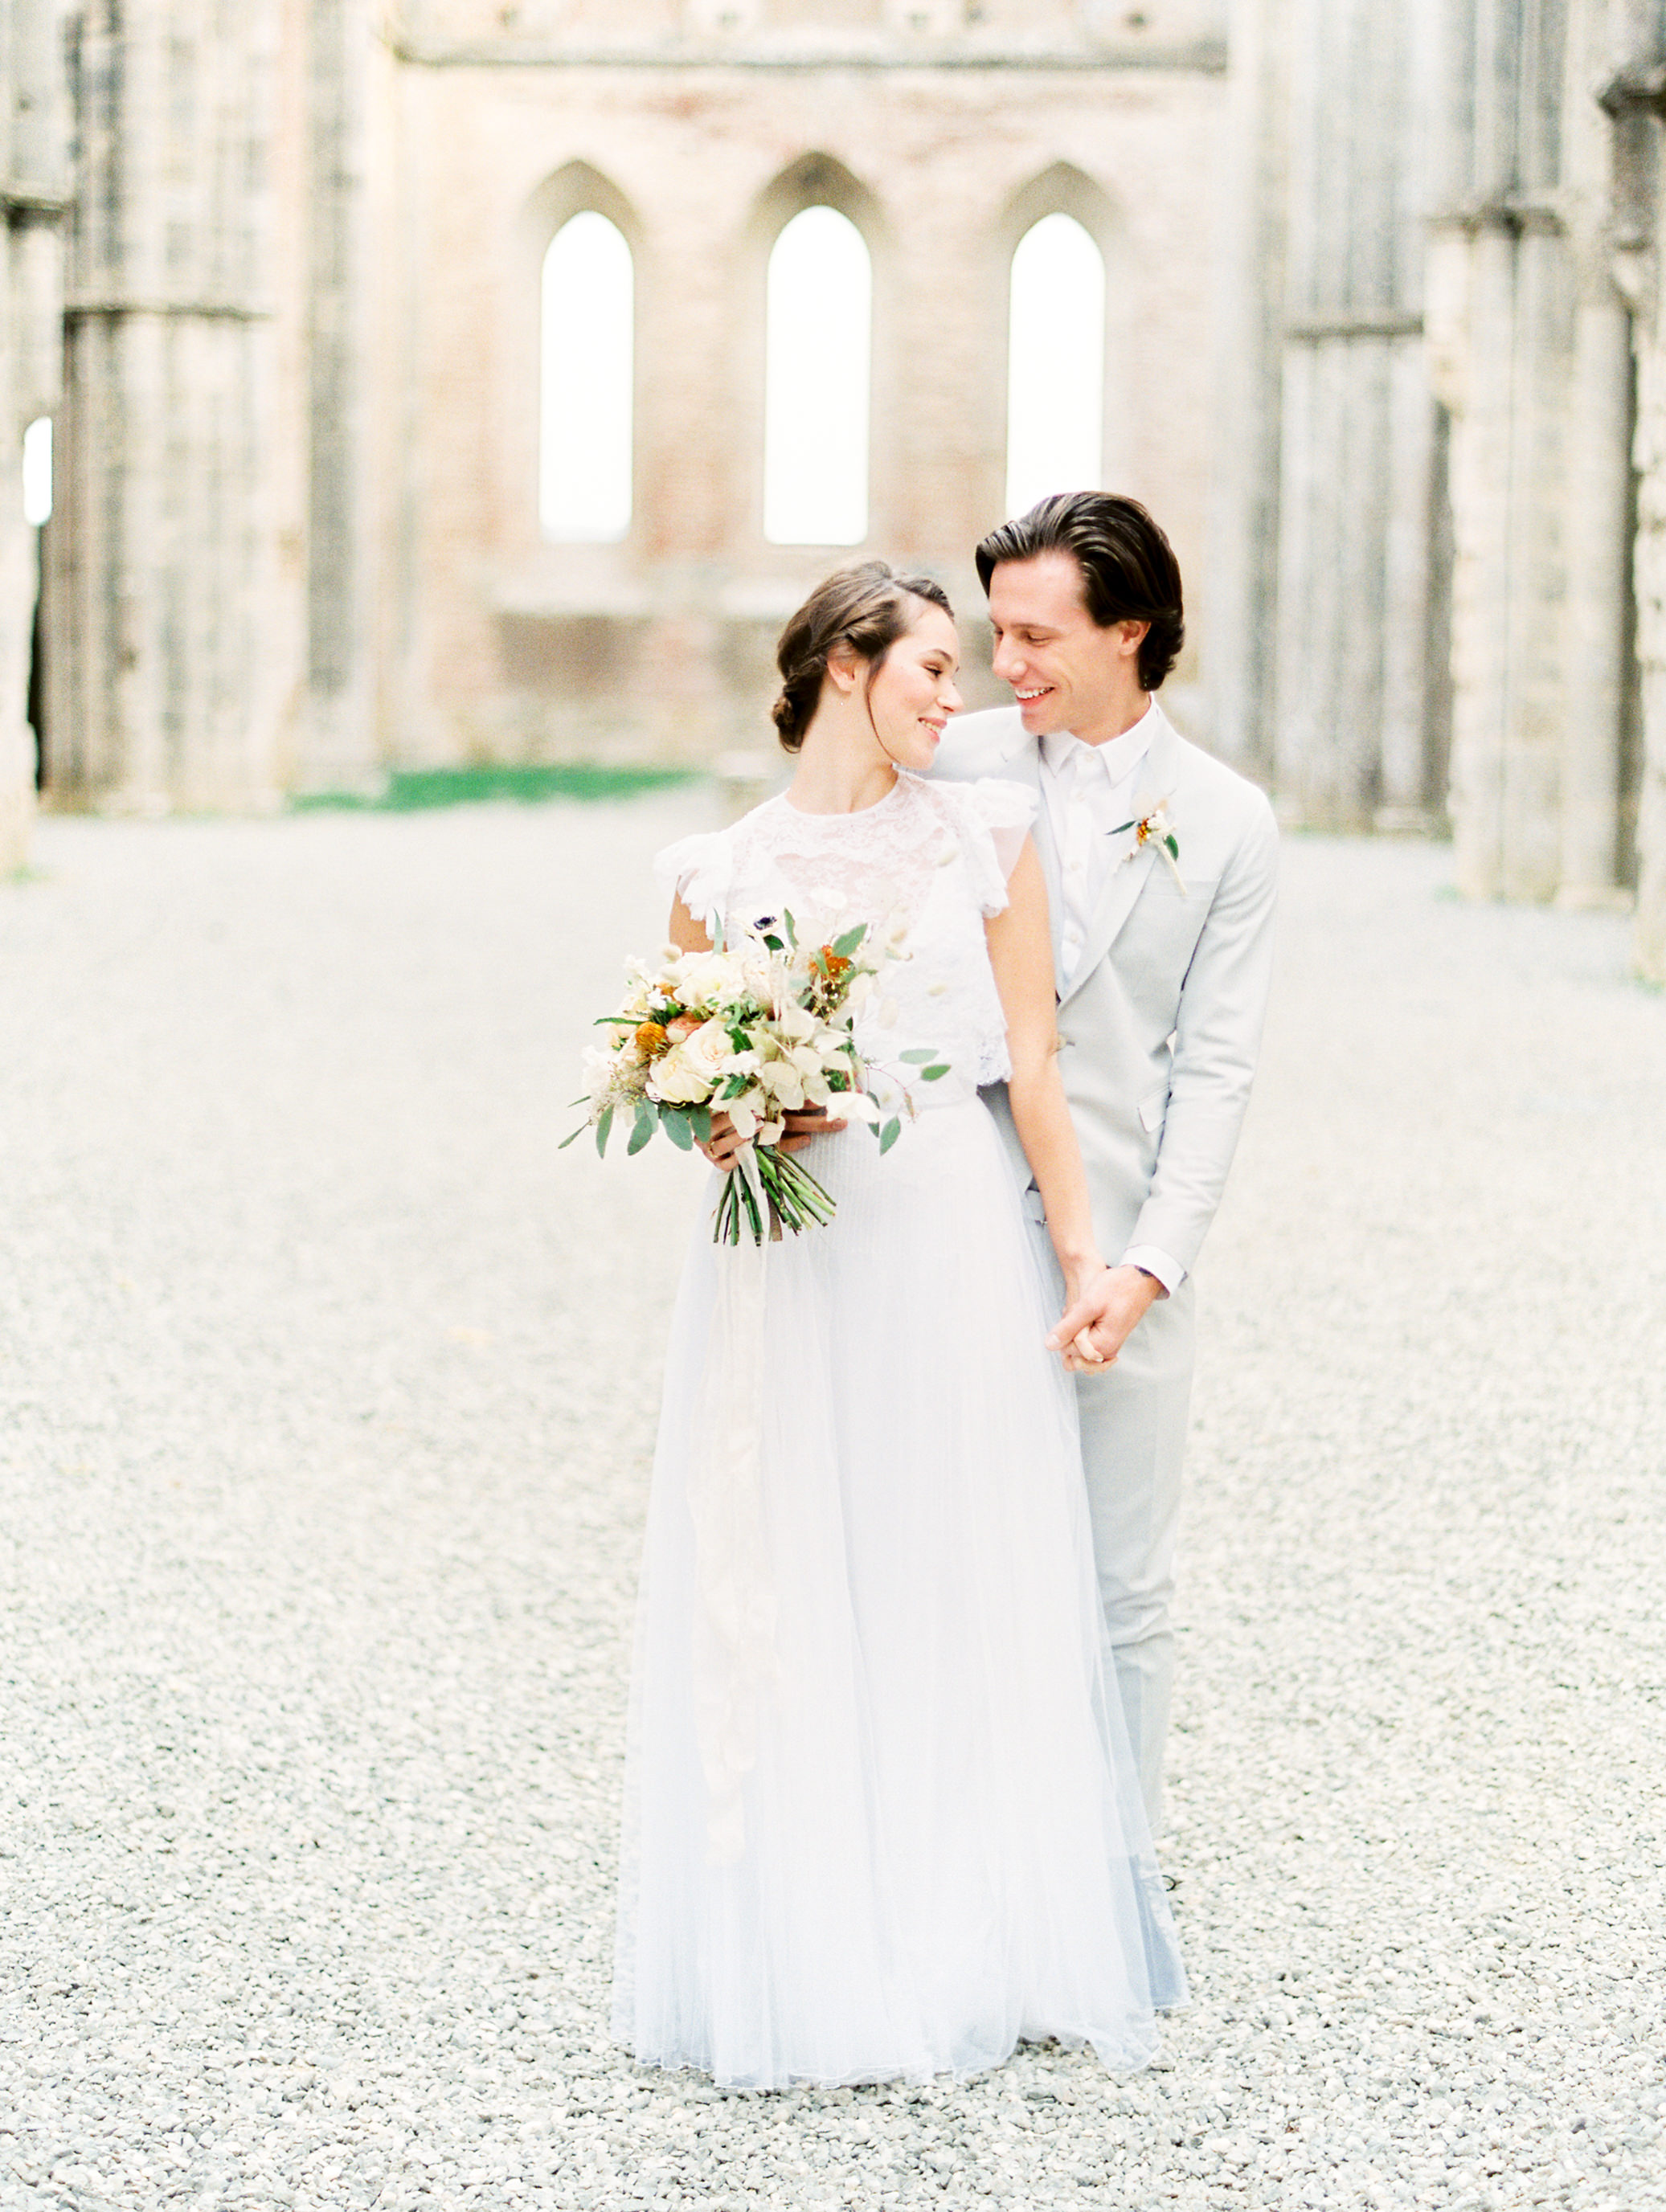 romantic-italy-wedding-in-tuscany-116.jpg